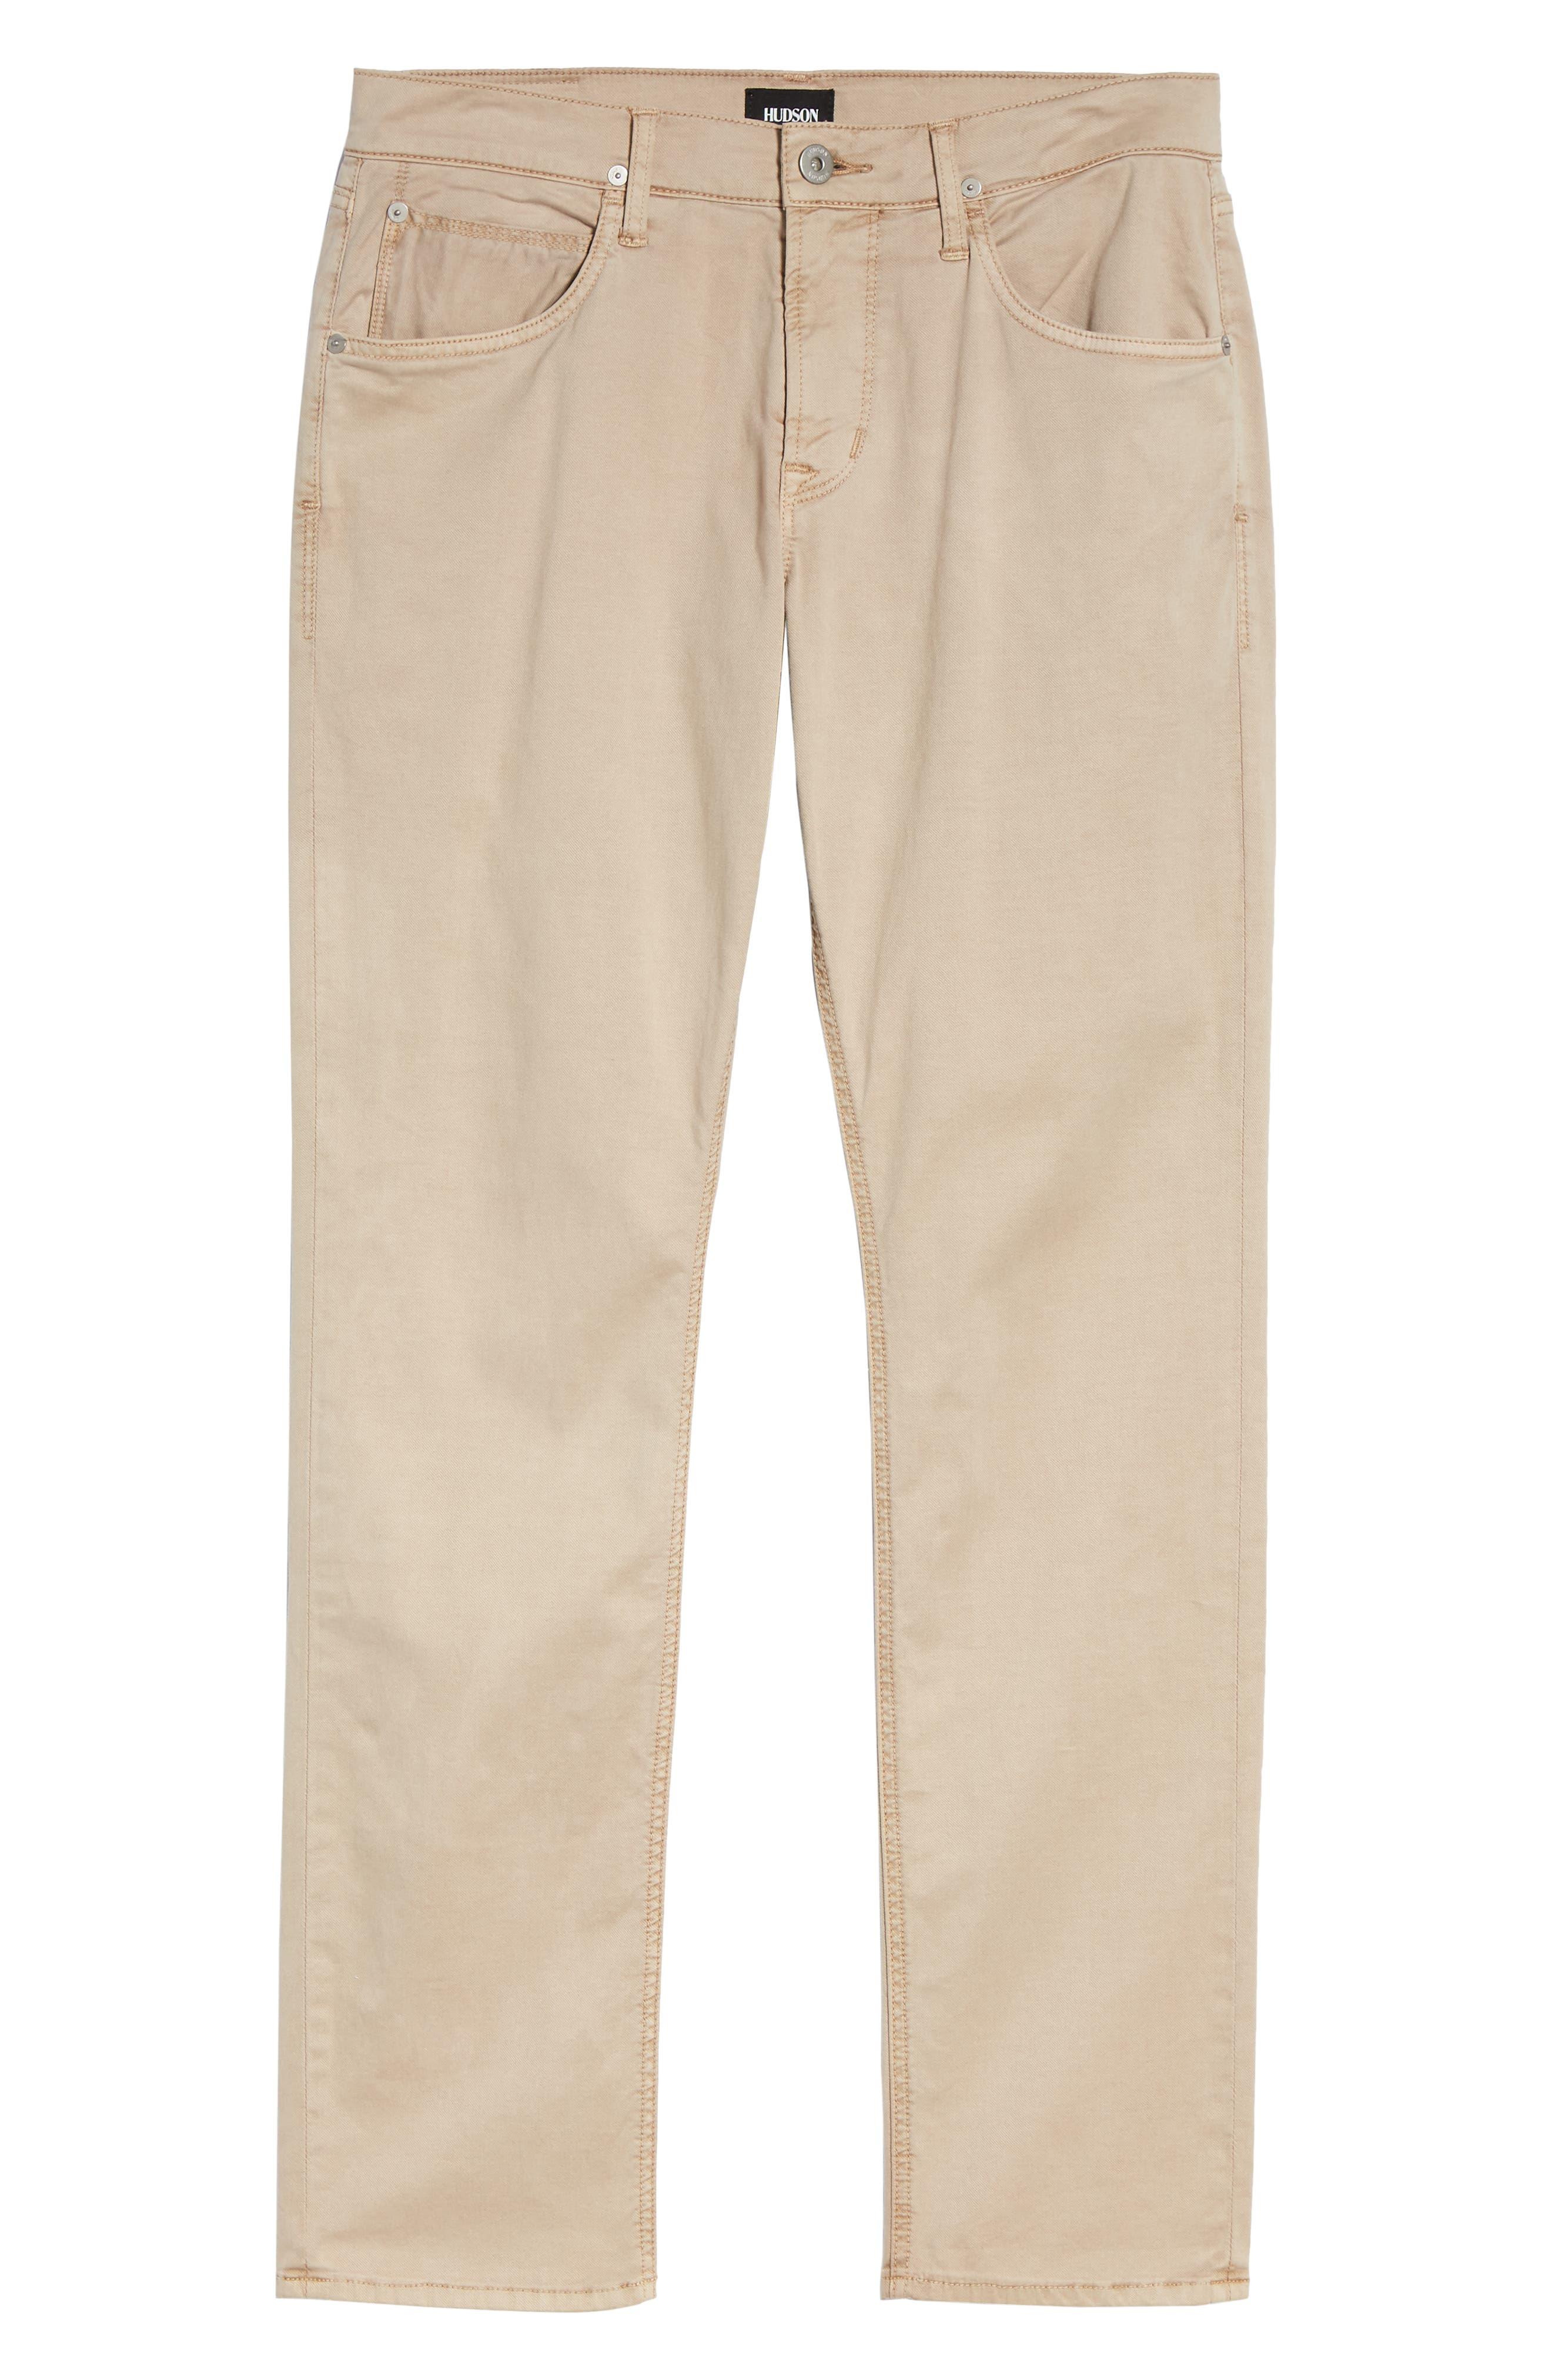 Blake Slim Fit Jeans,                             Alternate thumbnail 6, color,                             250